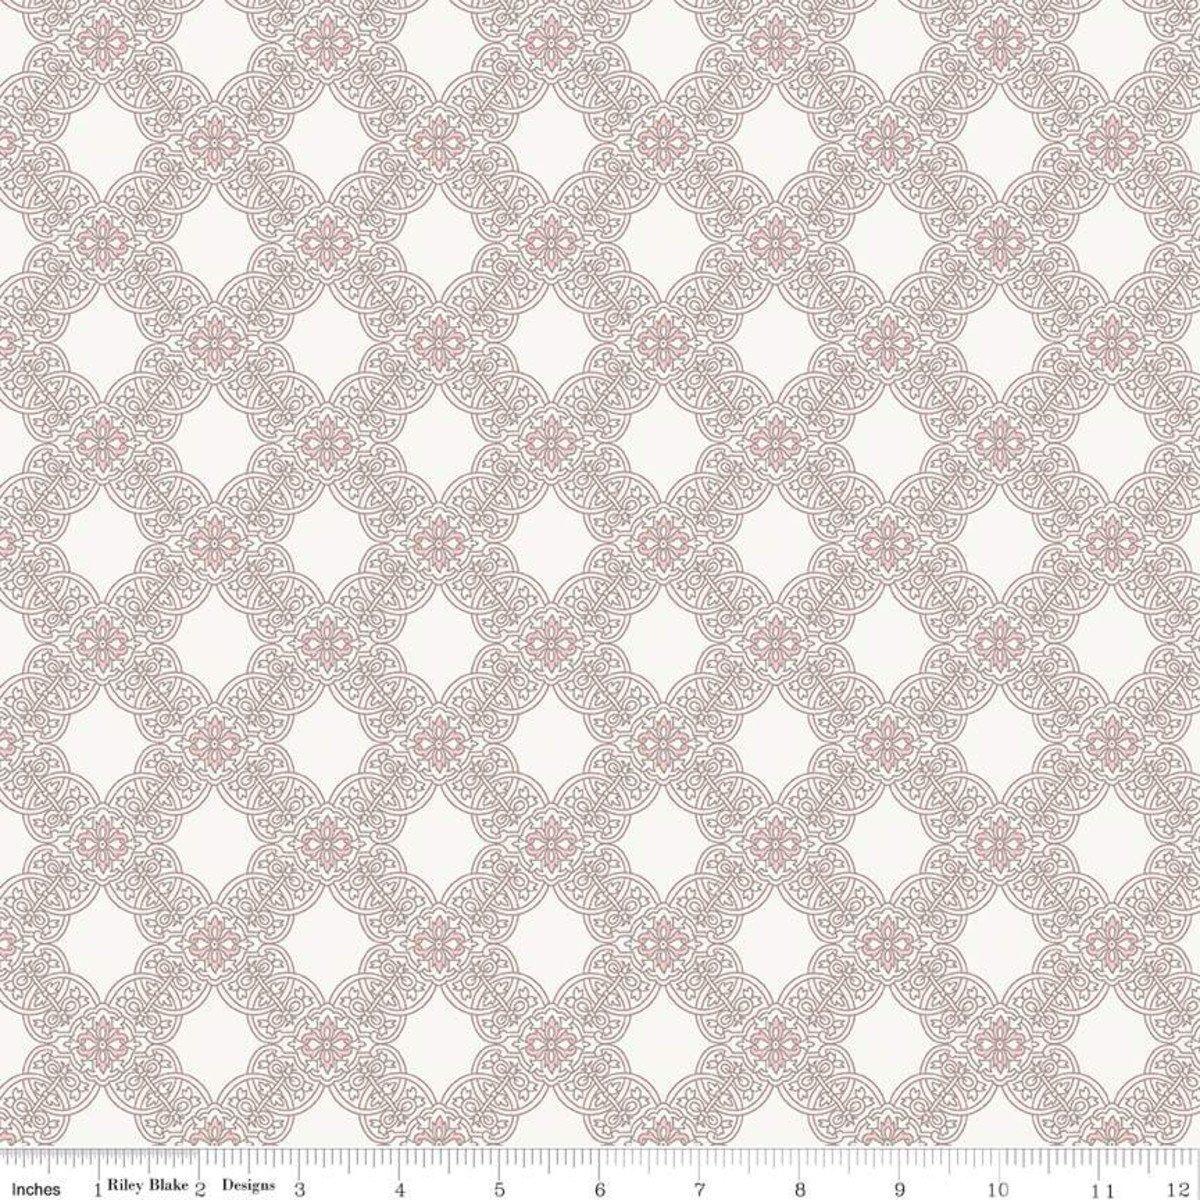 C7682-CREAM_Tile Rose Garden